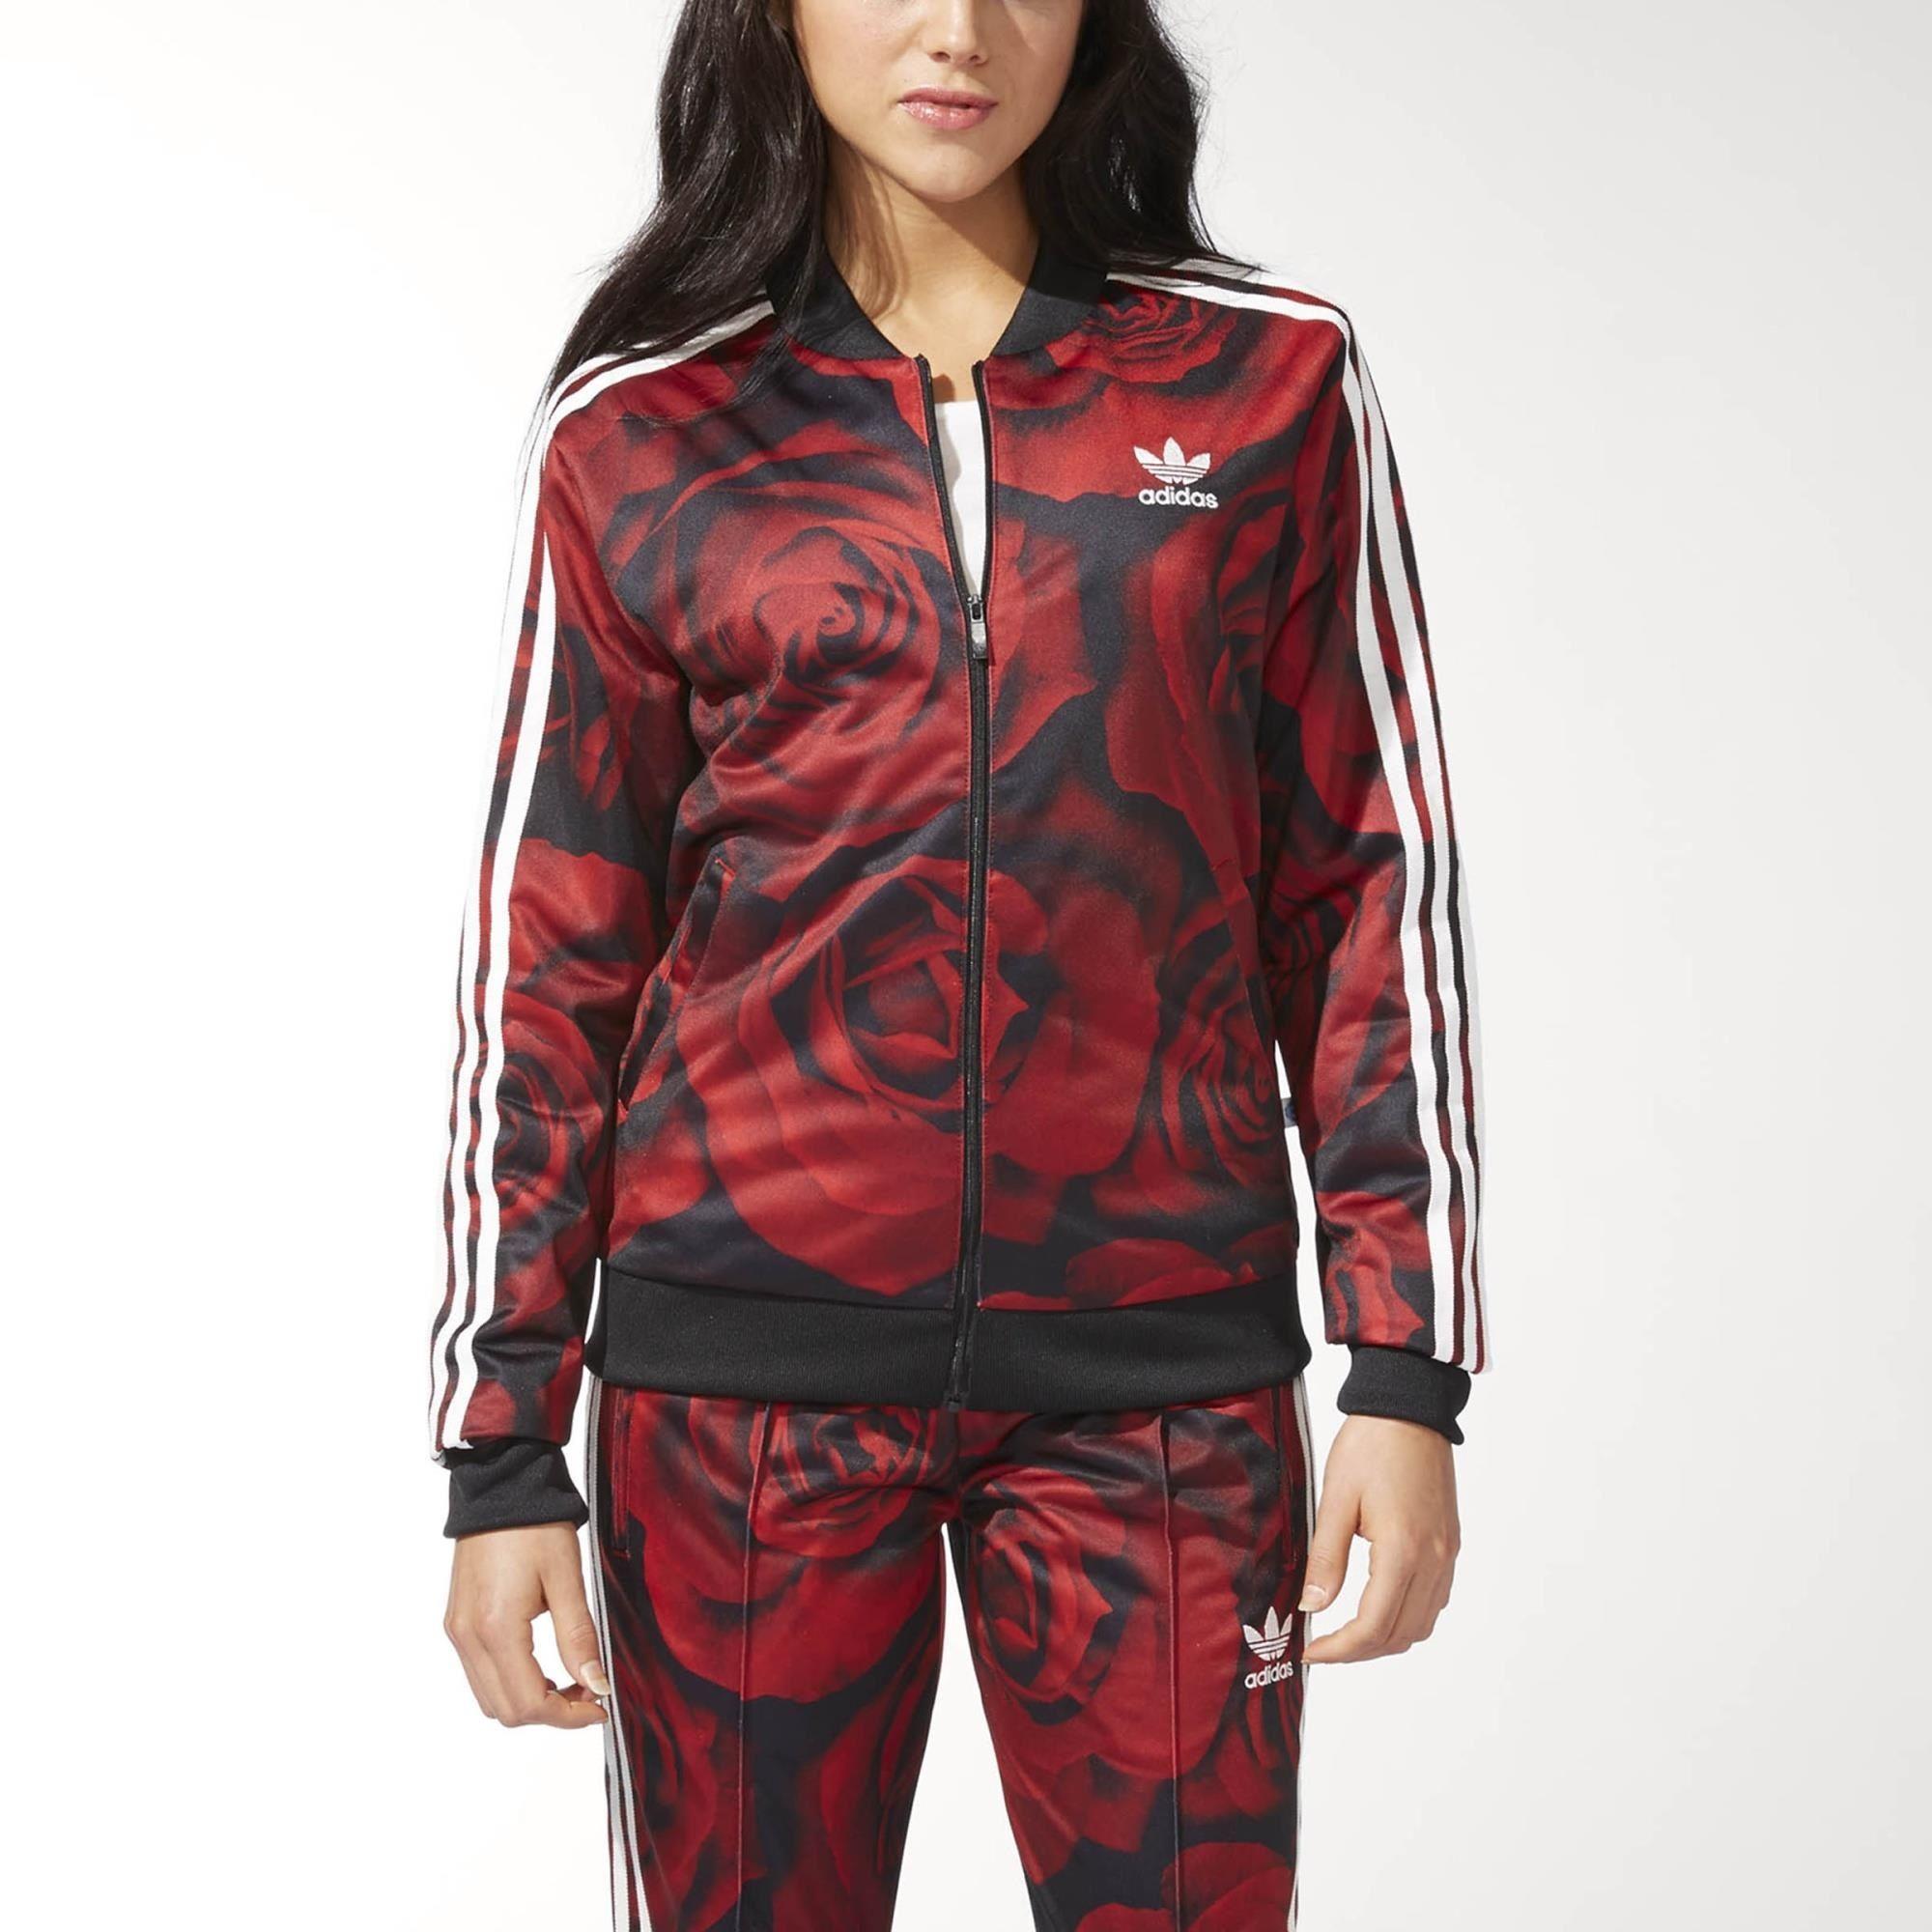 chaqueta de chandal mujer adidas rojo